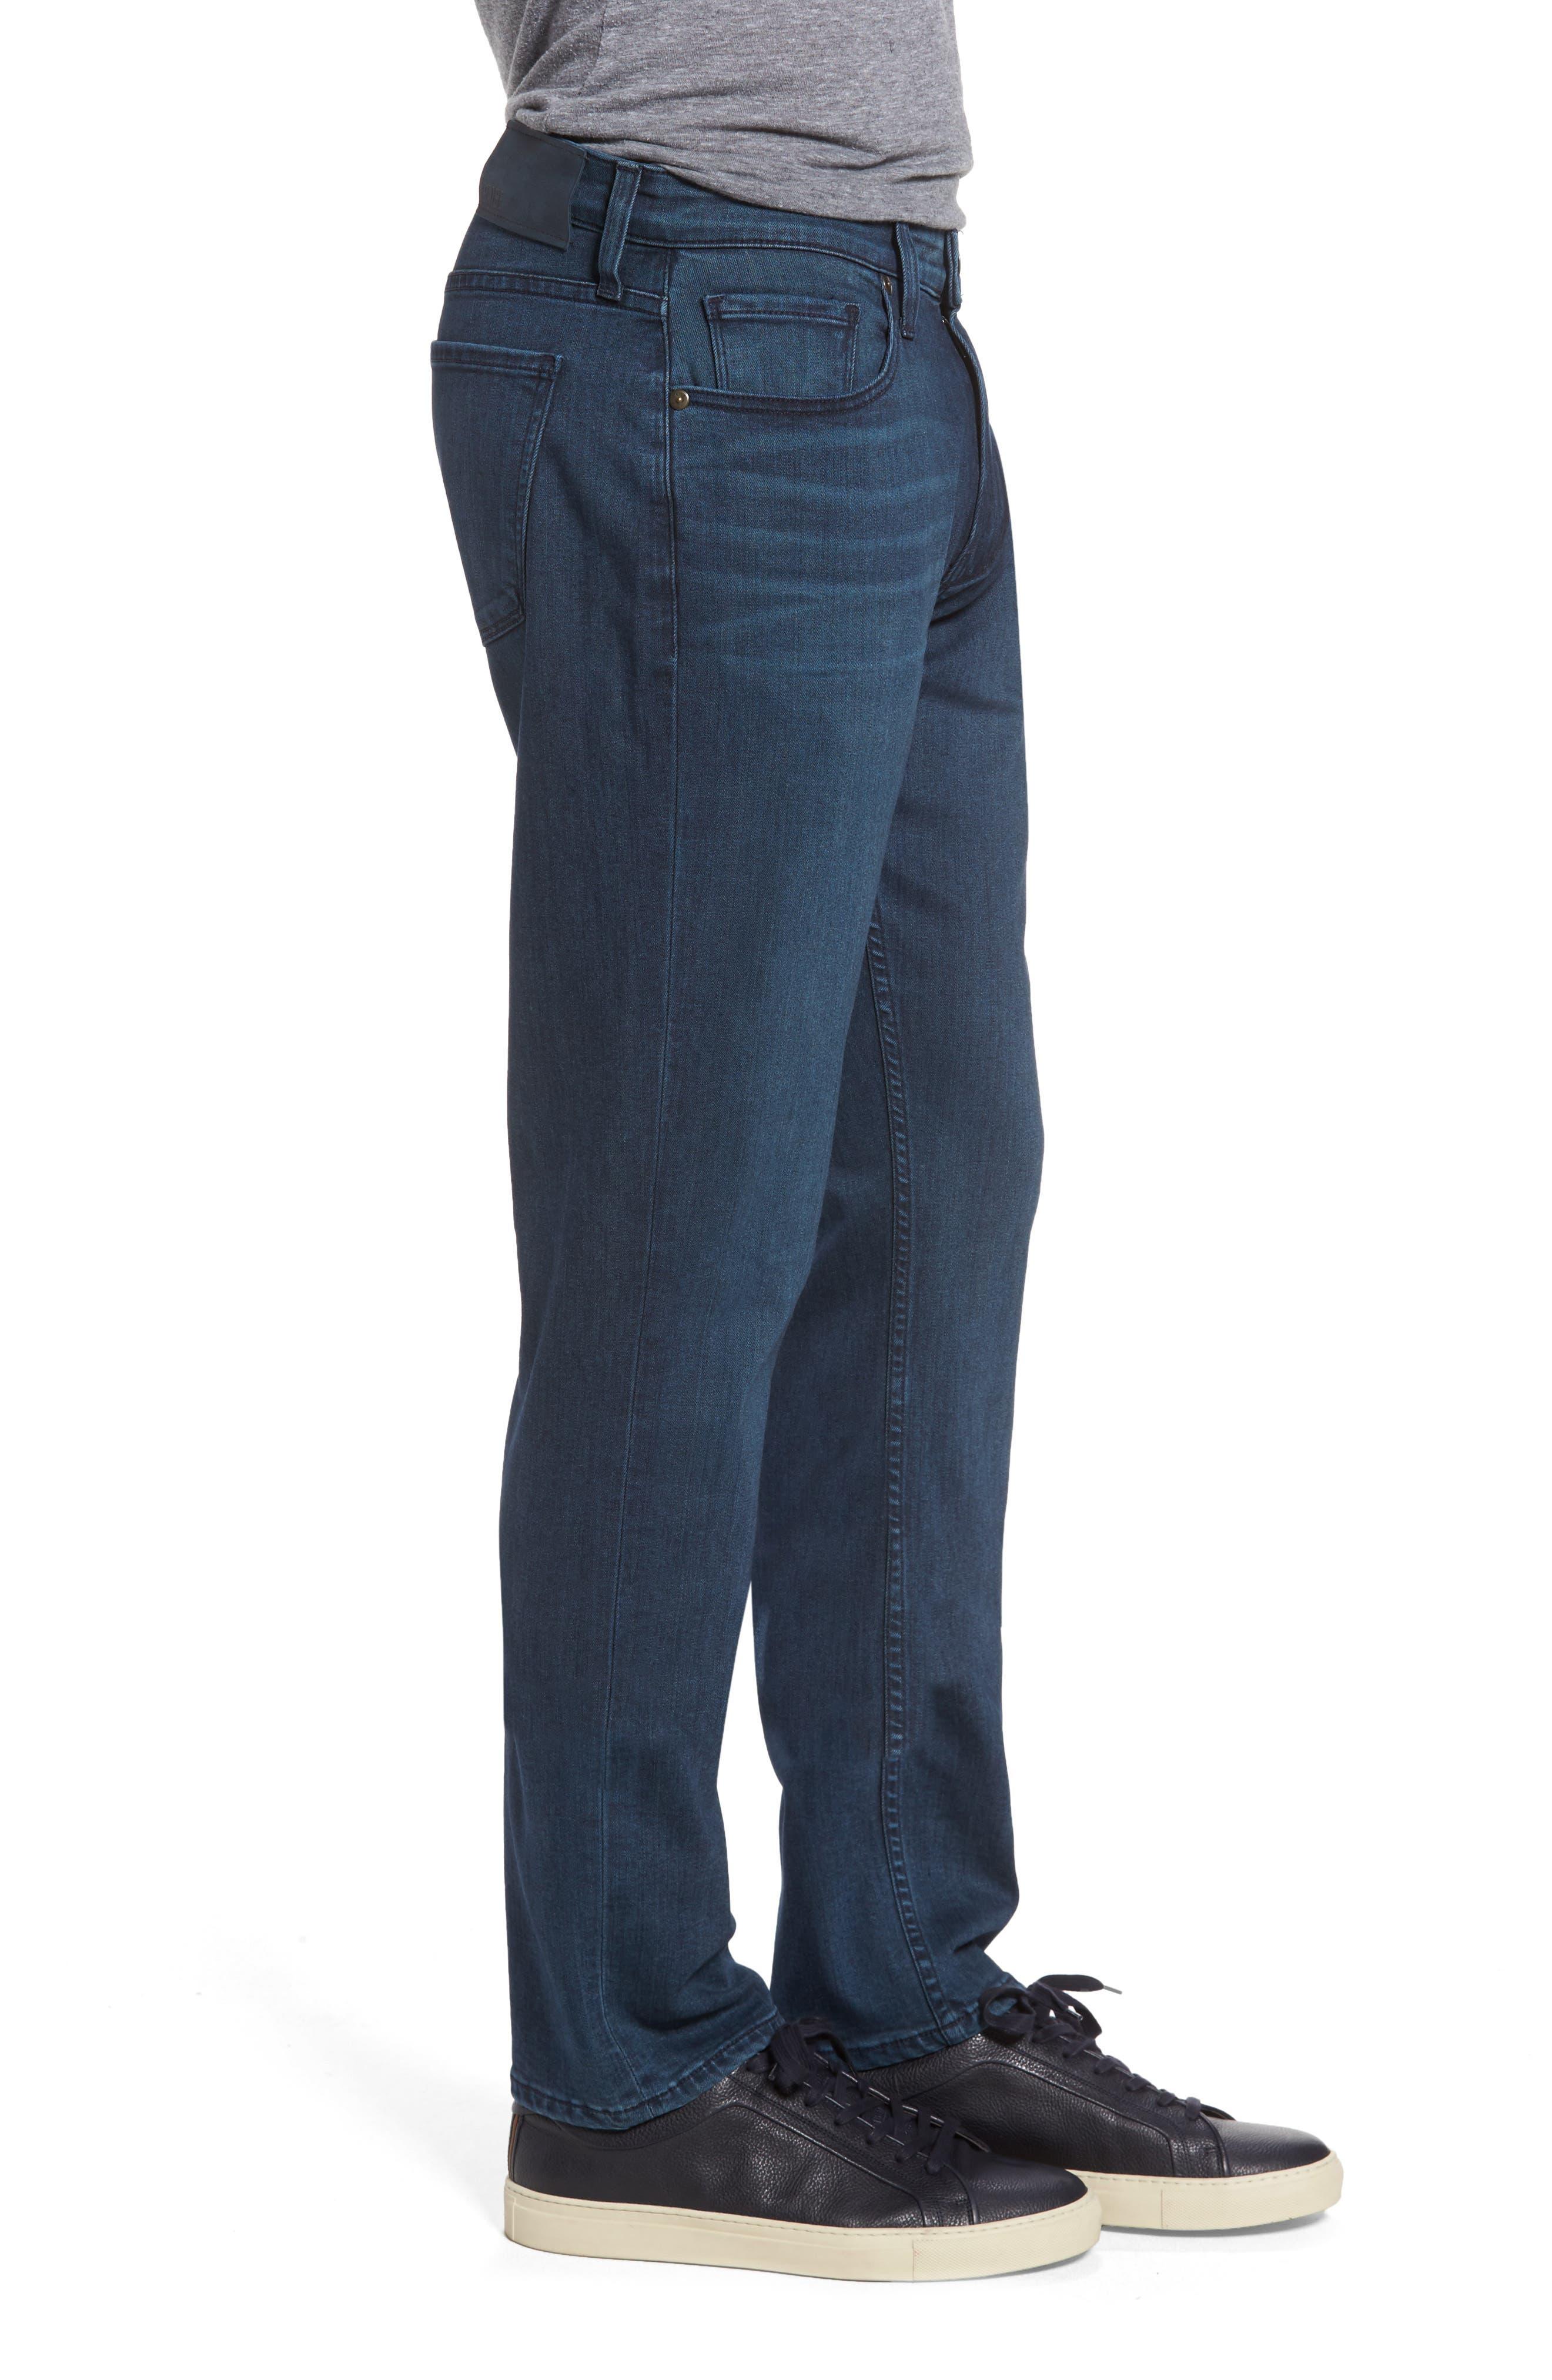 Transcend - Federal Slim Straight Fit Jeans,                             Alternate thumbnail 3, color,                             Elroy